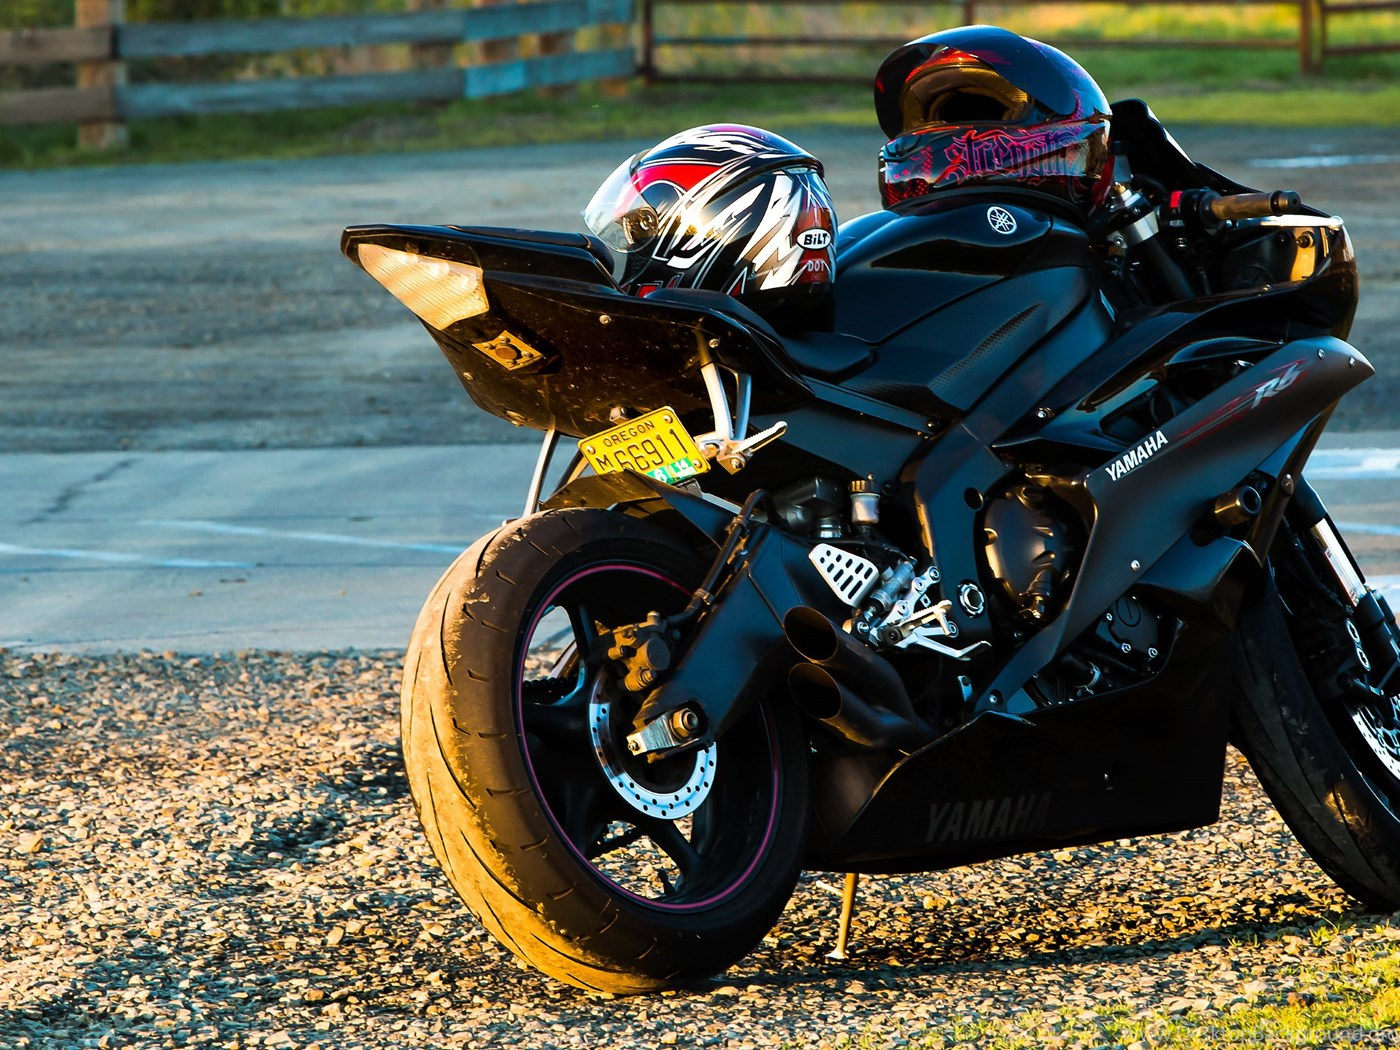 Yamaha Motorcycles HD Wallpapers. 4K Wallpapers Desktop